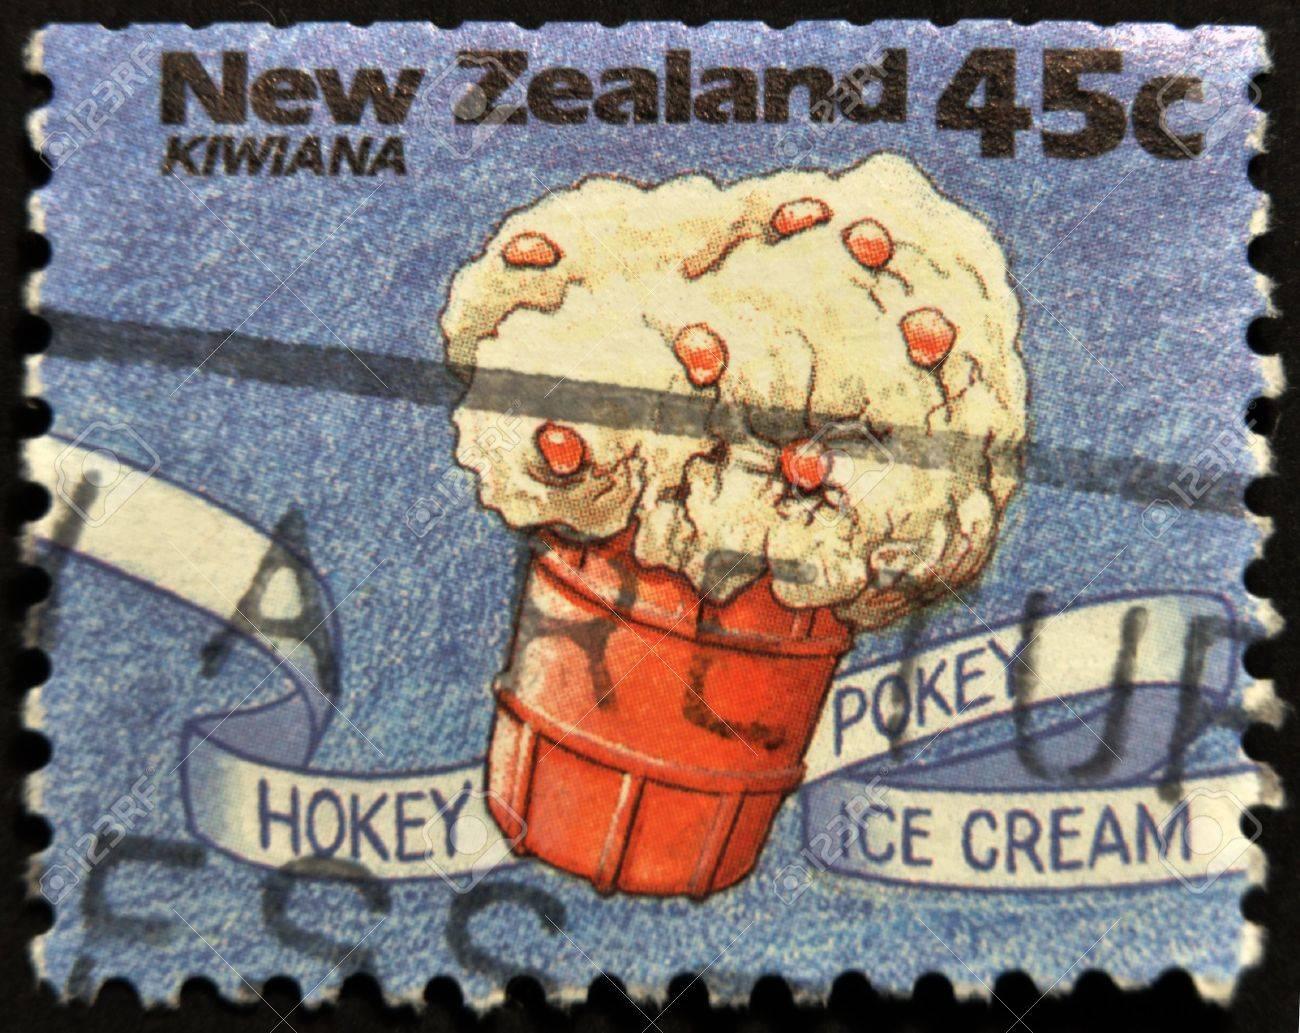 NEW ZEALAND - CIRCA 1994: A stamp printed in New Zealand shows hokey pokey ice cream, Kiwiana series, circa 1994 Stock Photo - 12039692